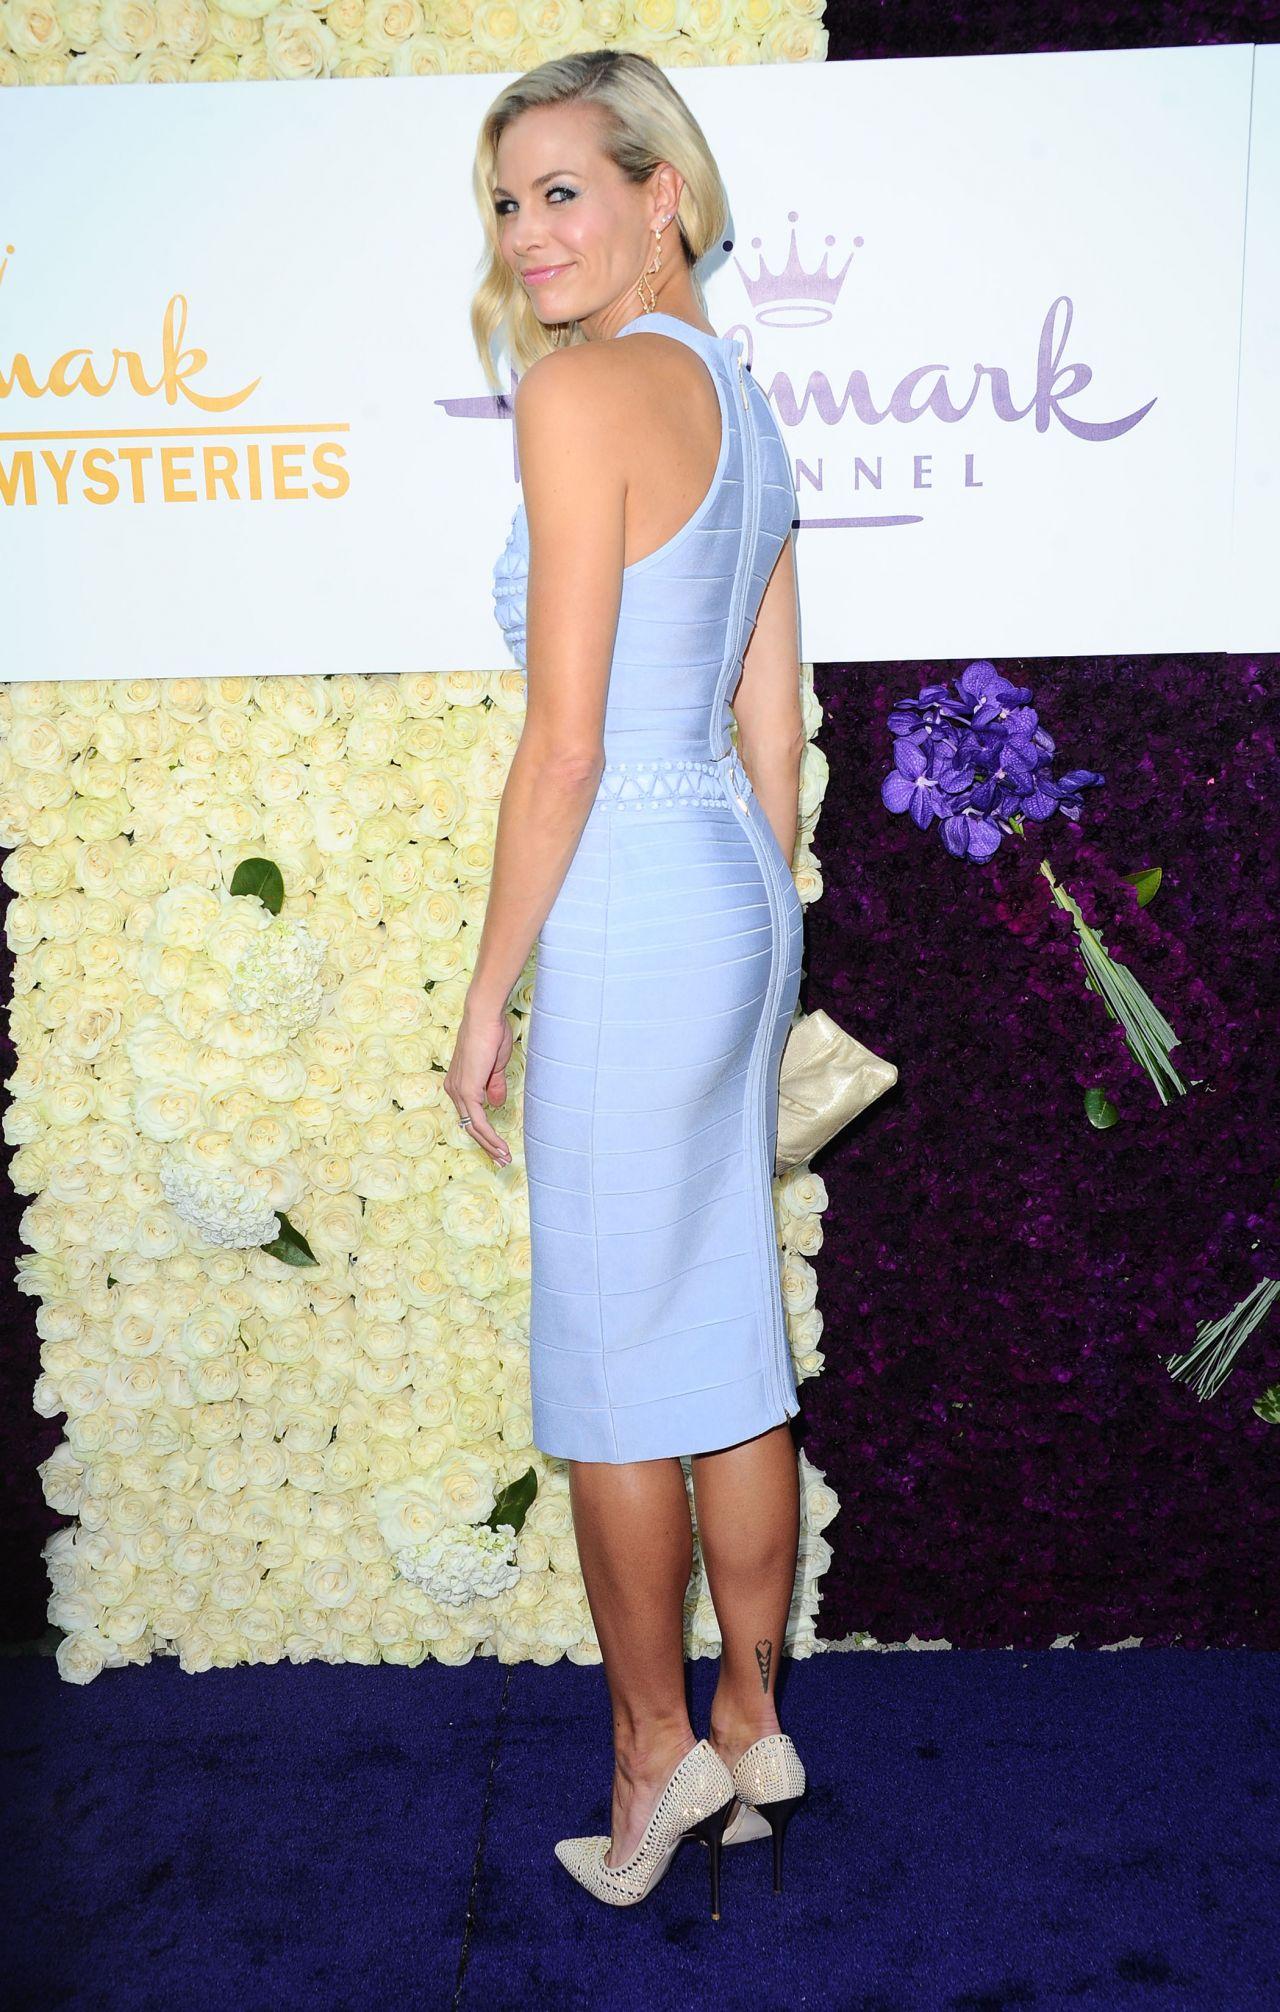 Brooke Burns Hallmark Channel 2015 Summer Tca Tour Event